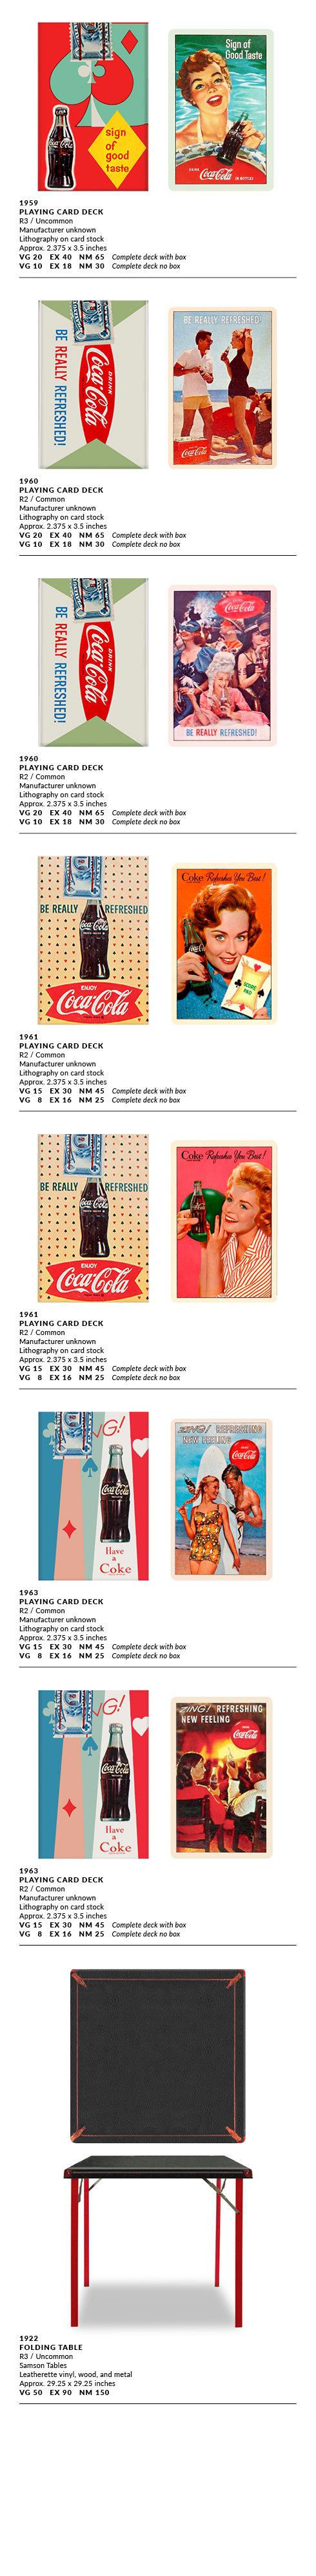 Cards_6.jpg